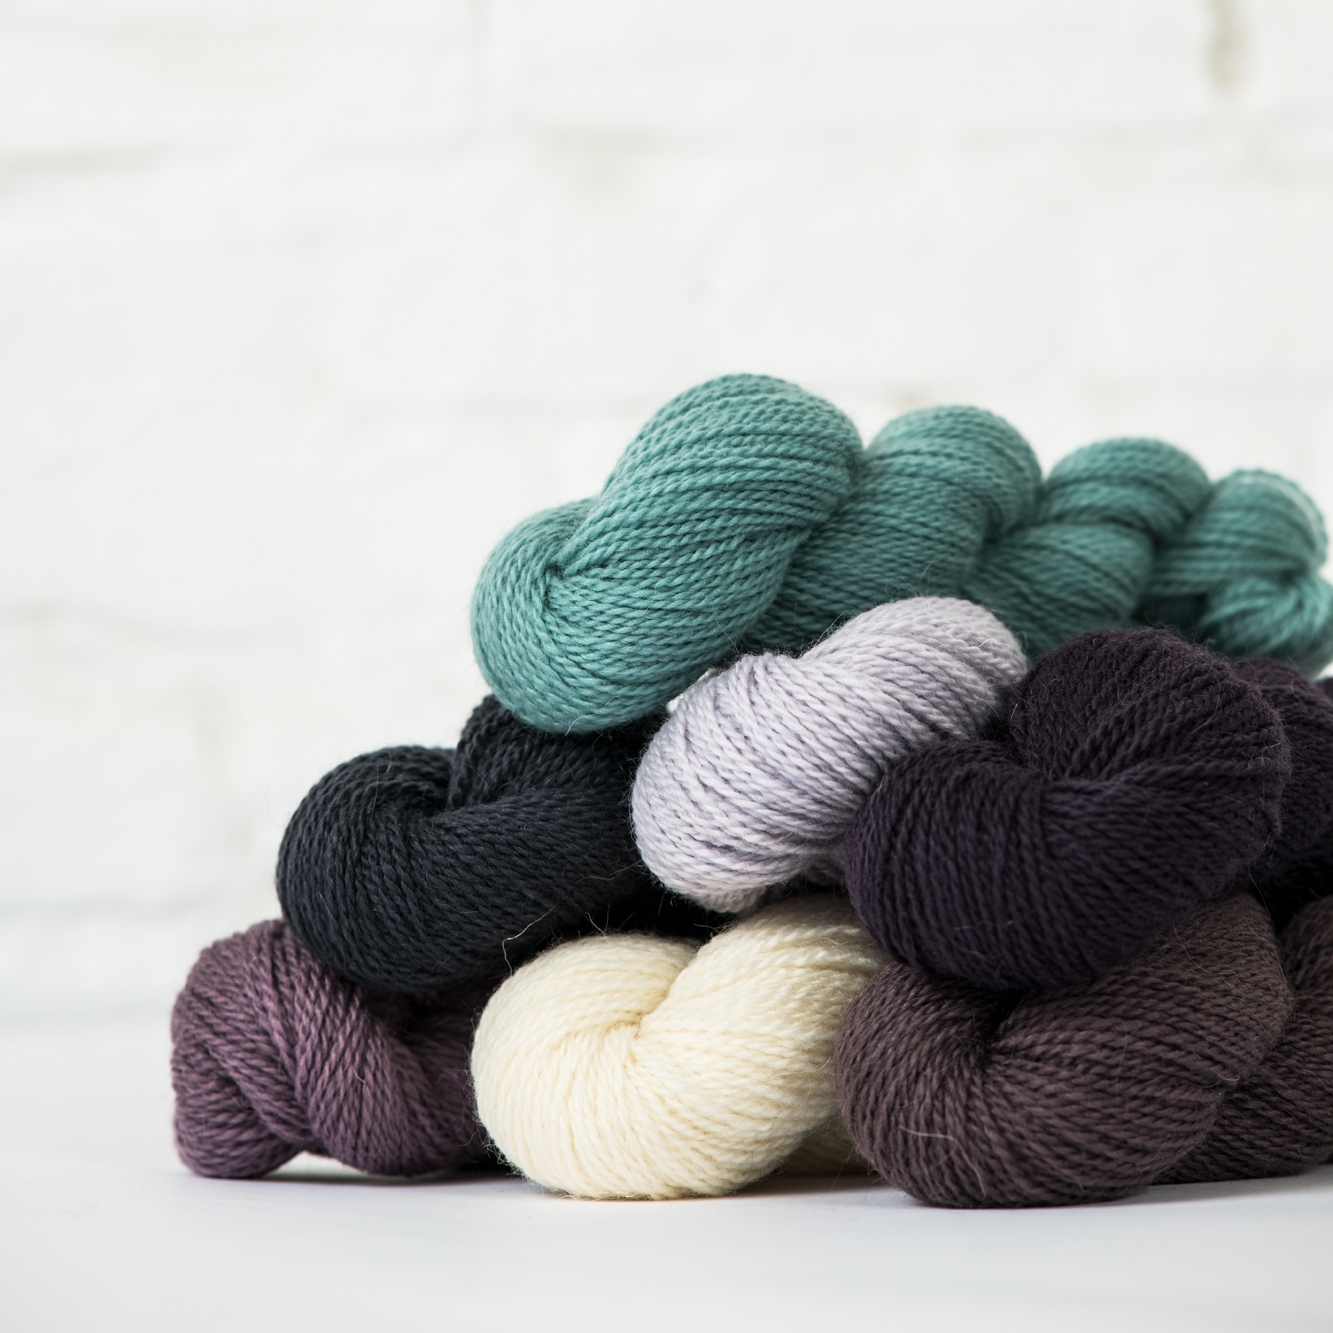 ANDORRA   60% Merino wool, 20% highland wool, 20% Mohair  185 yard / 50 gm skein